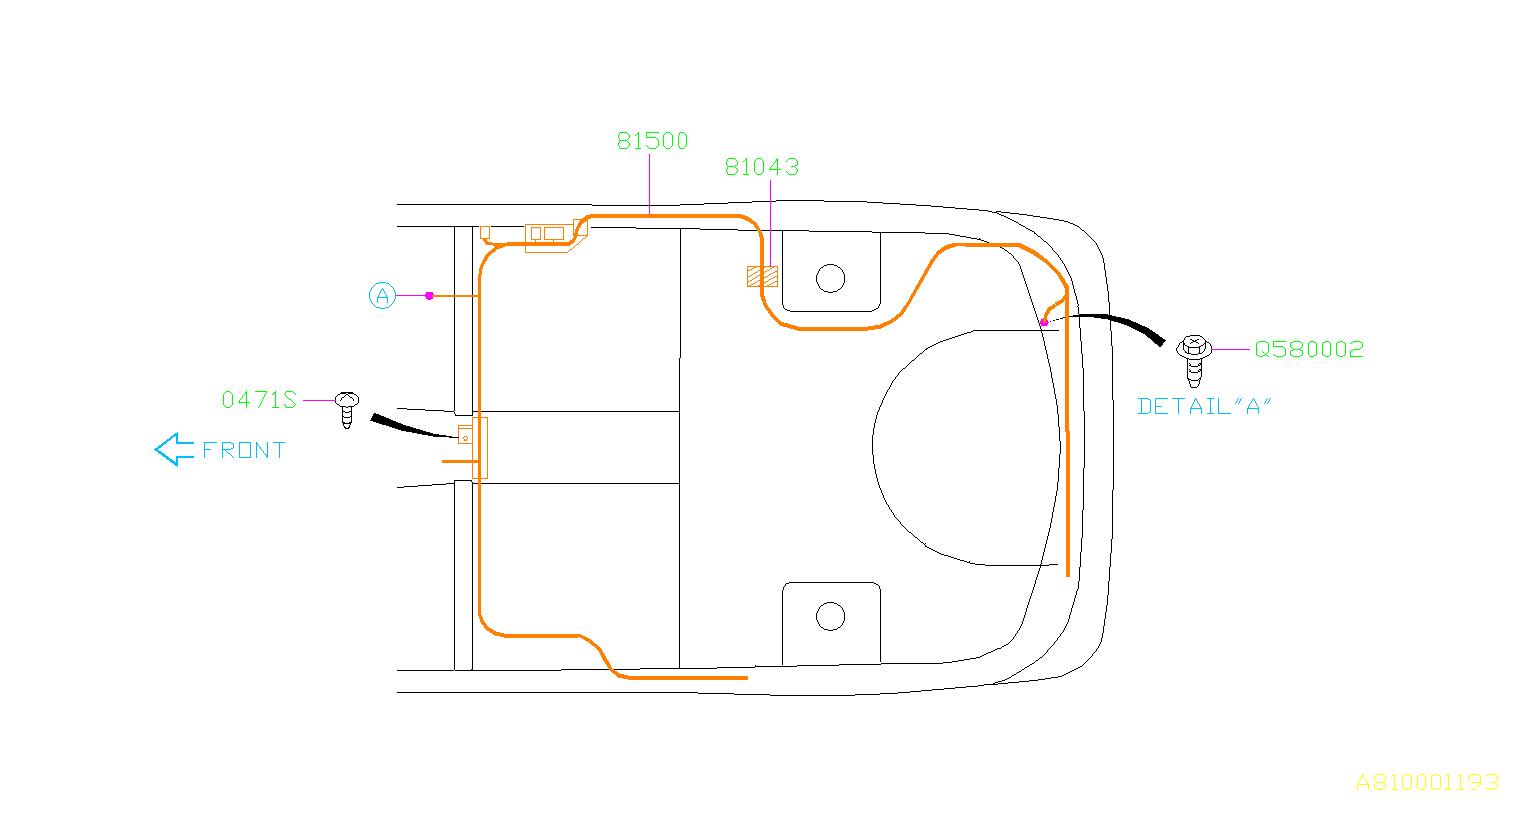 Subaru Impreza Harness-rear  Wiring  Main  Electrical  Airbag